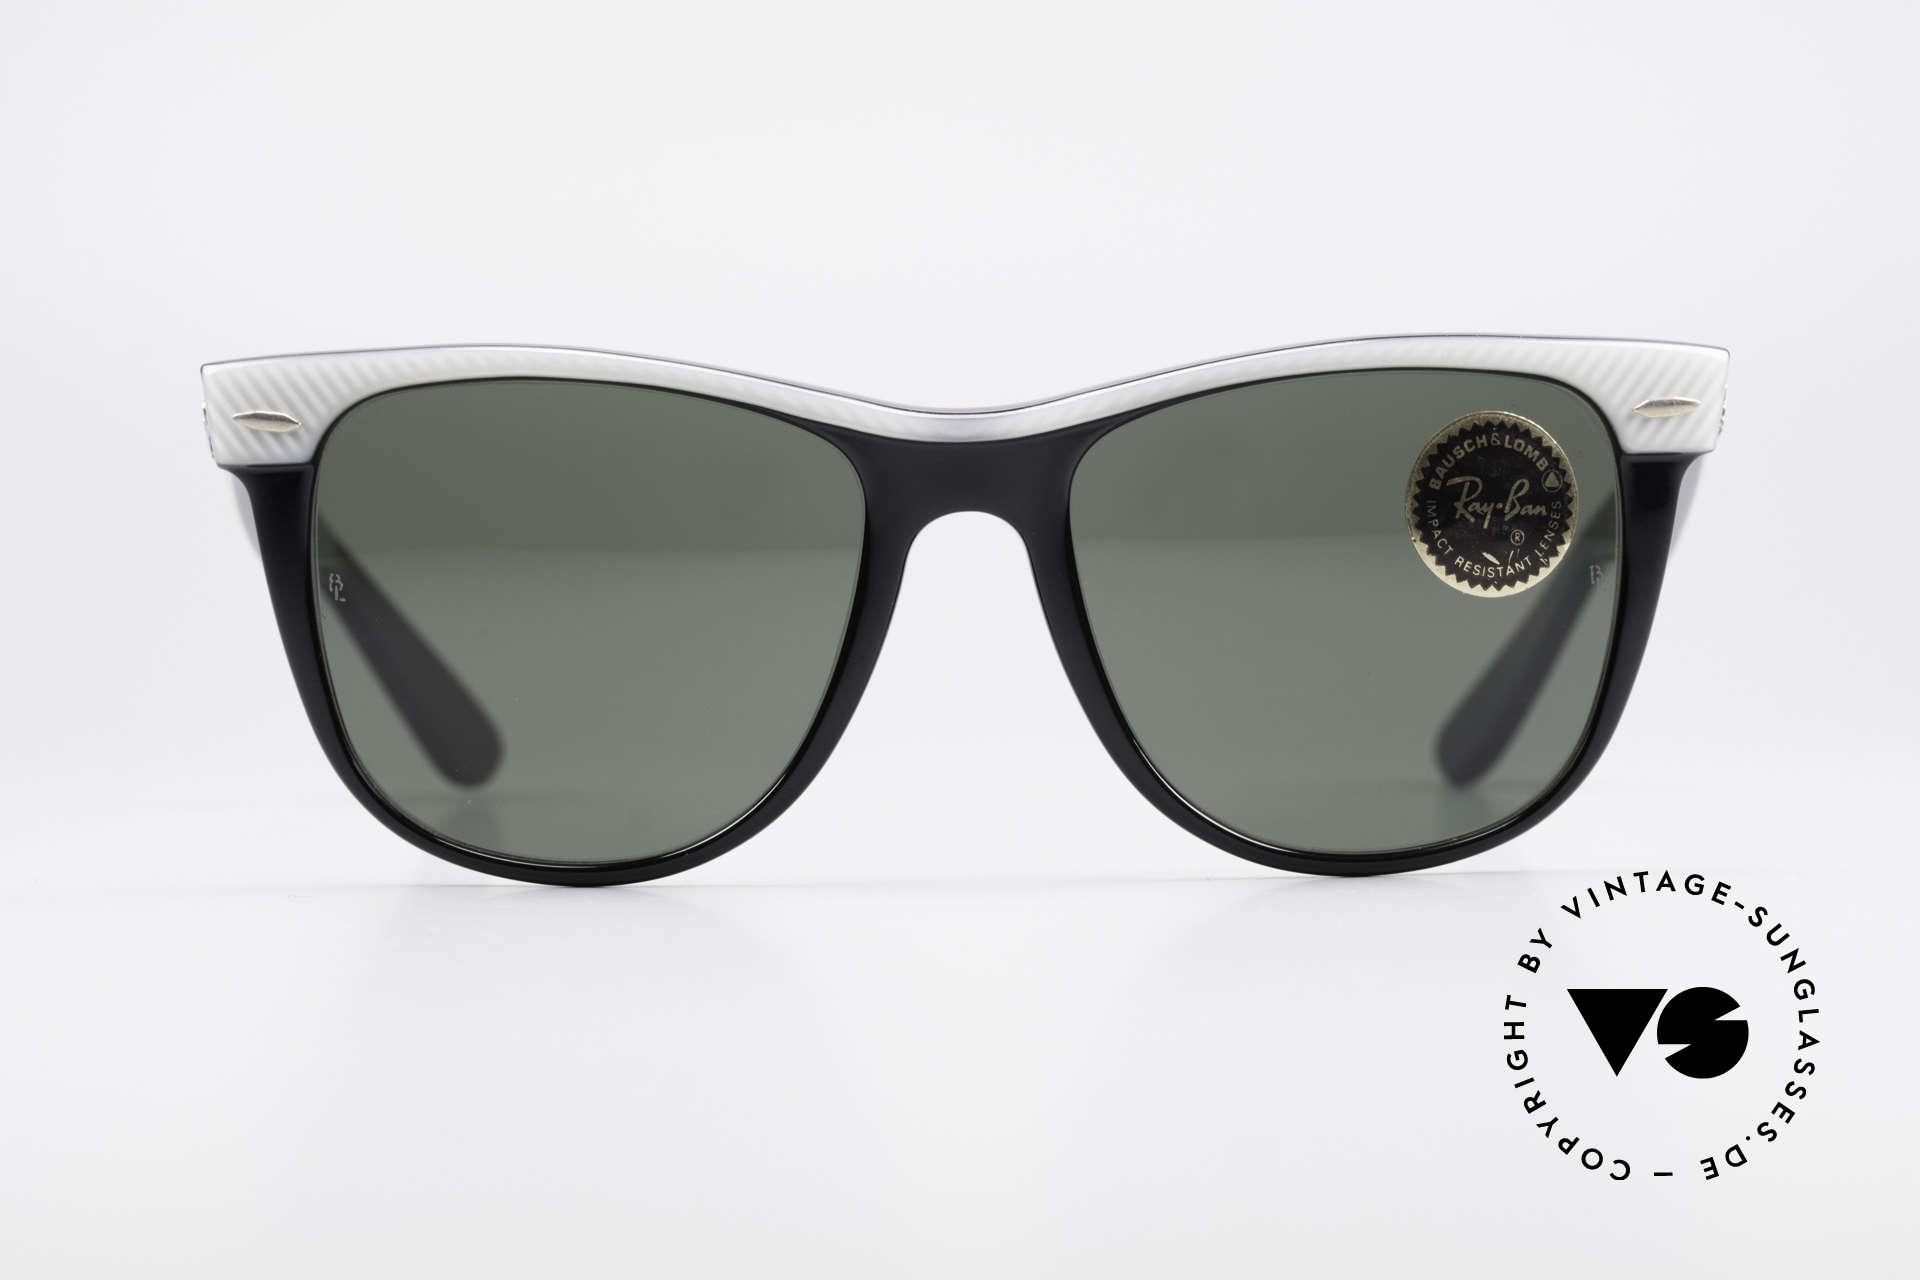 a7cafb877e Sunglasses Ray Ban Wayfarer II B L USA Original Wayfarer